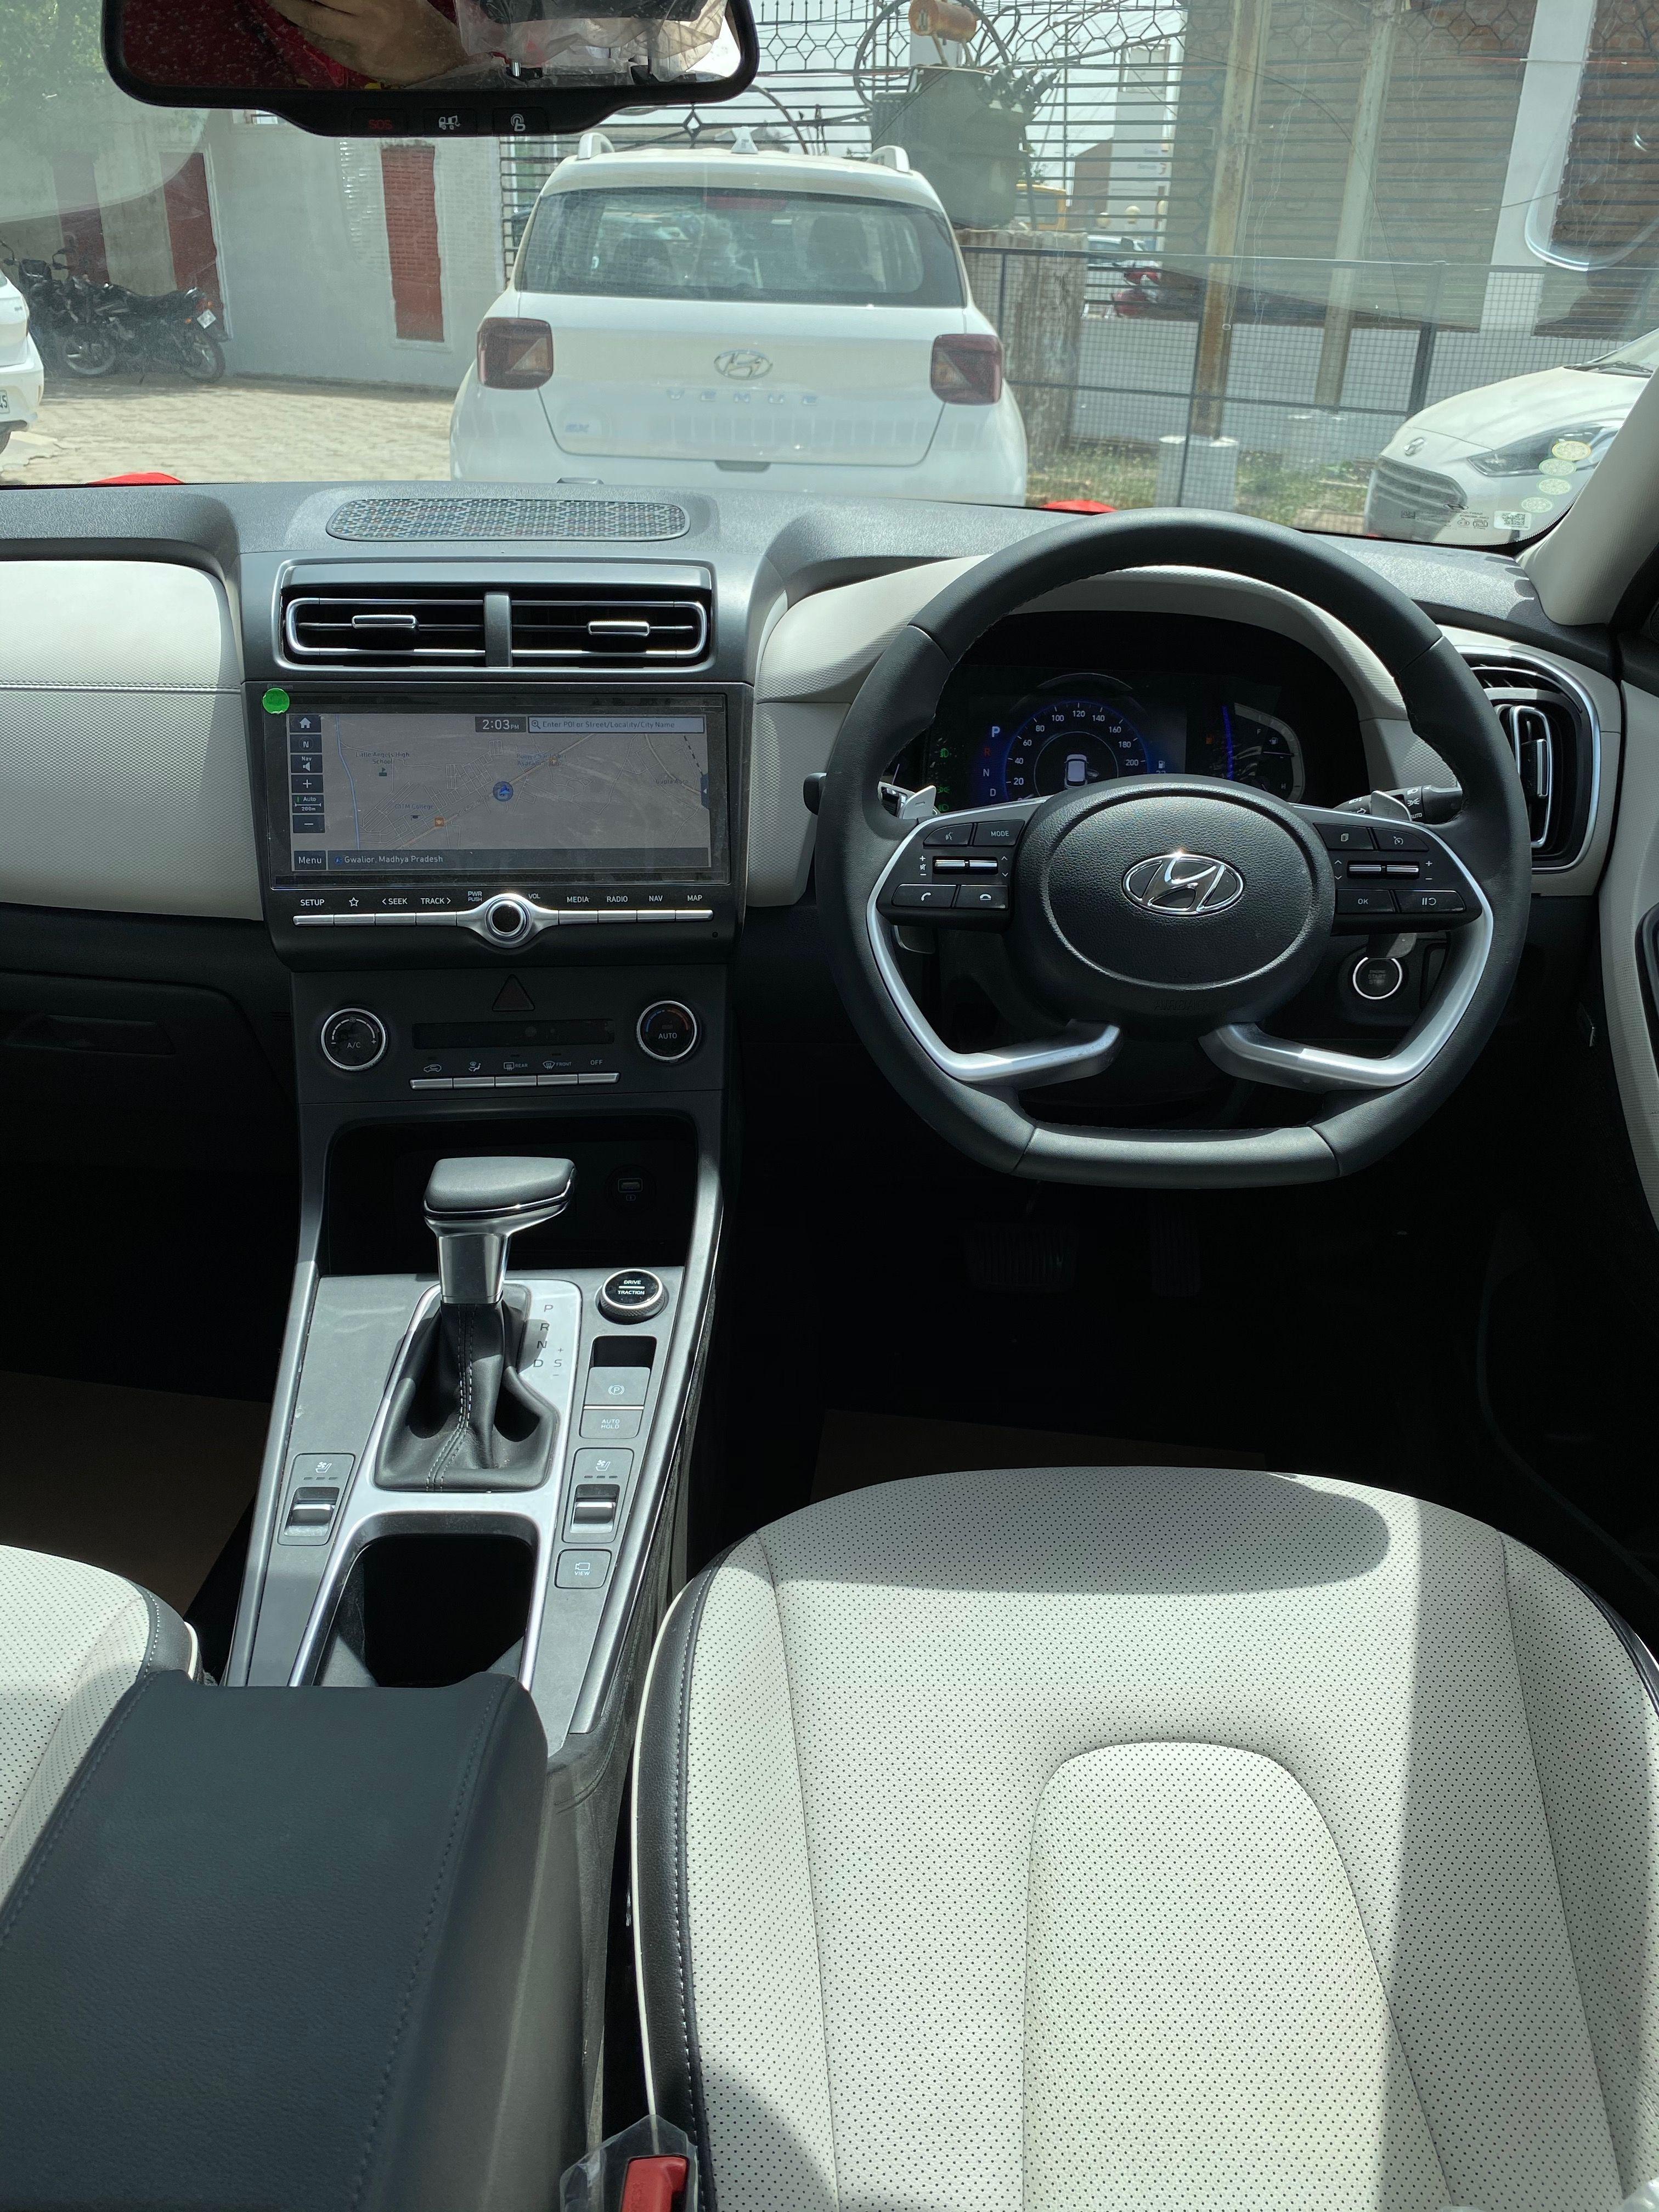 2020 Hyundai Creta Detailed Test Drive Review Hindi Youtube In 2020 Driving Test Hyundai Driving